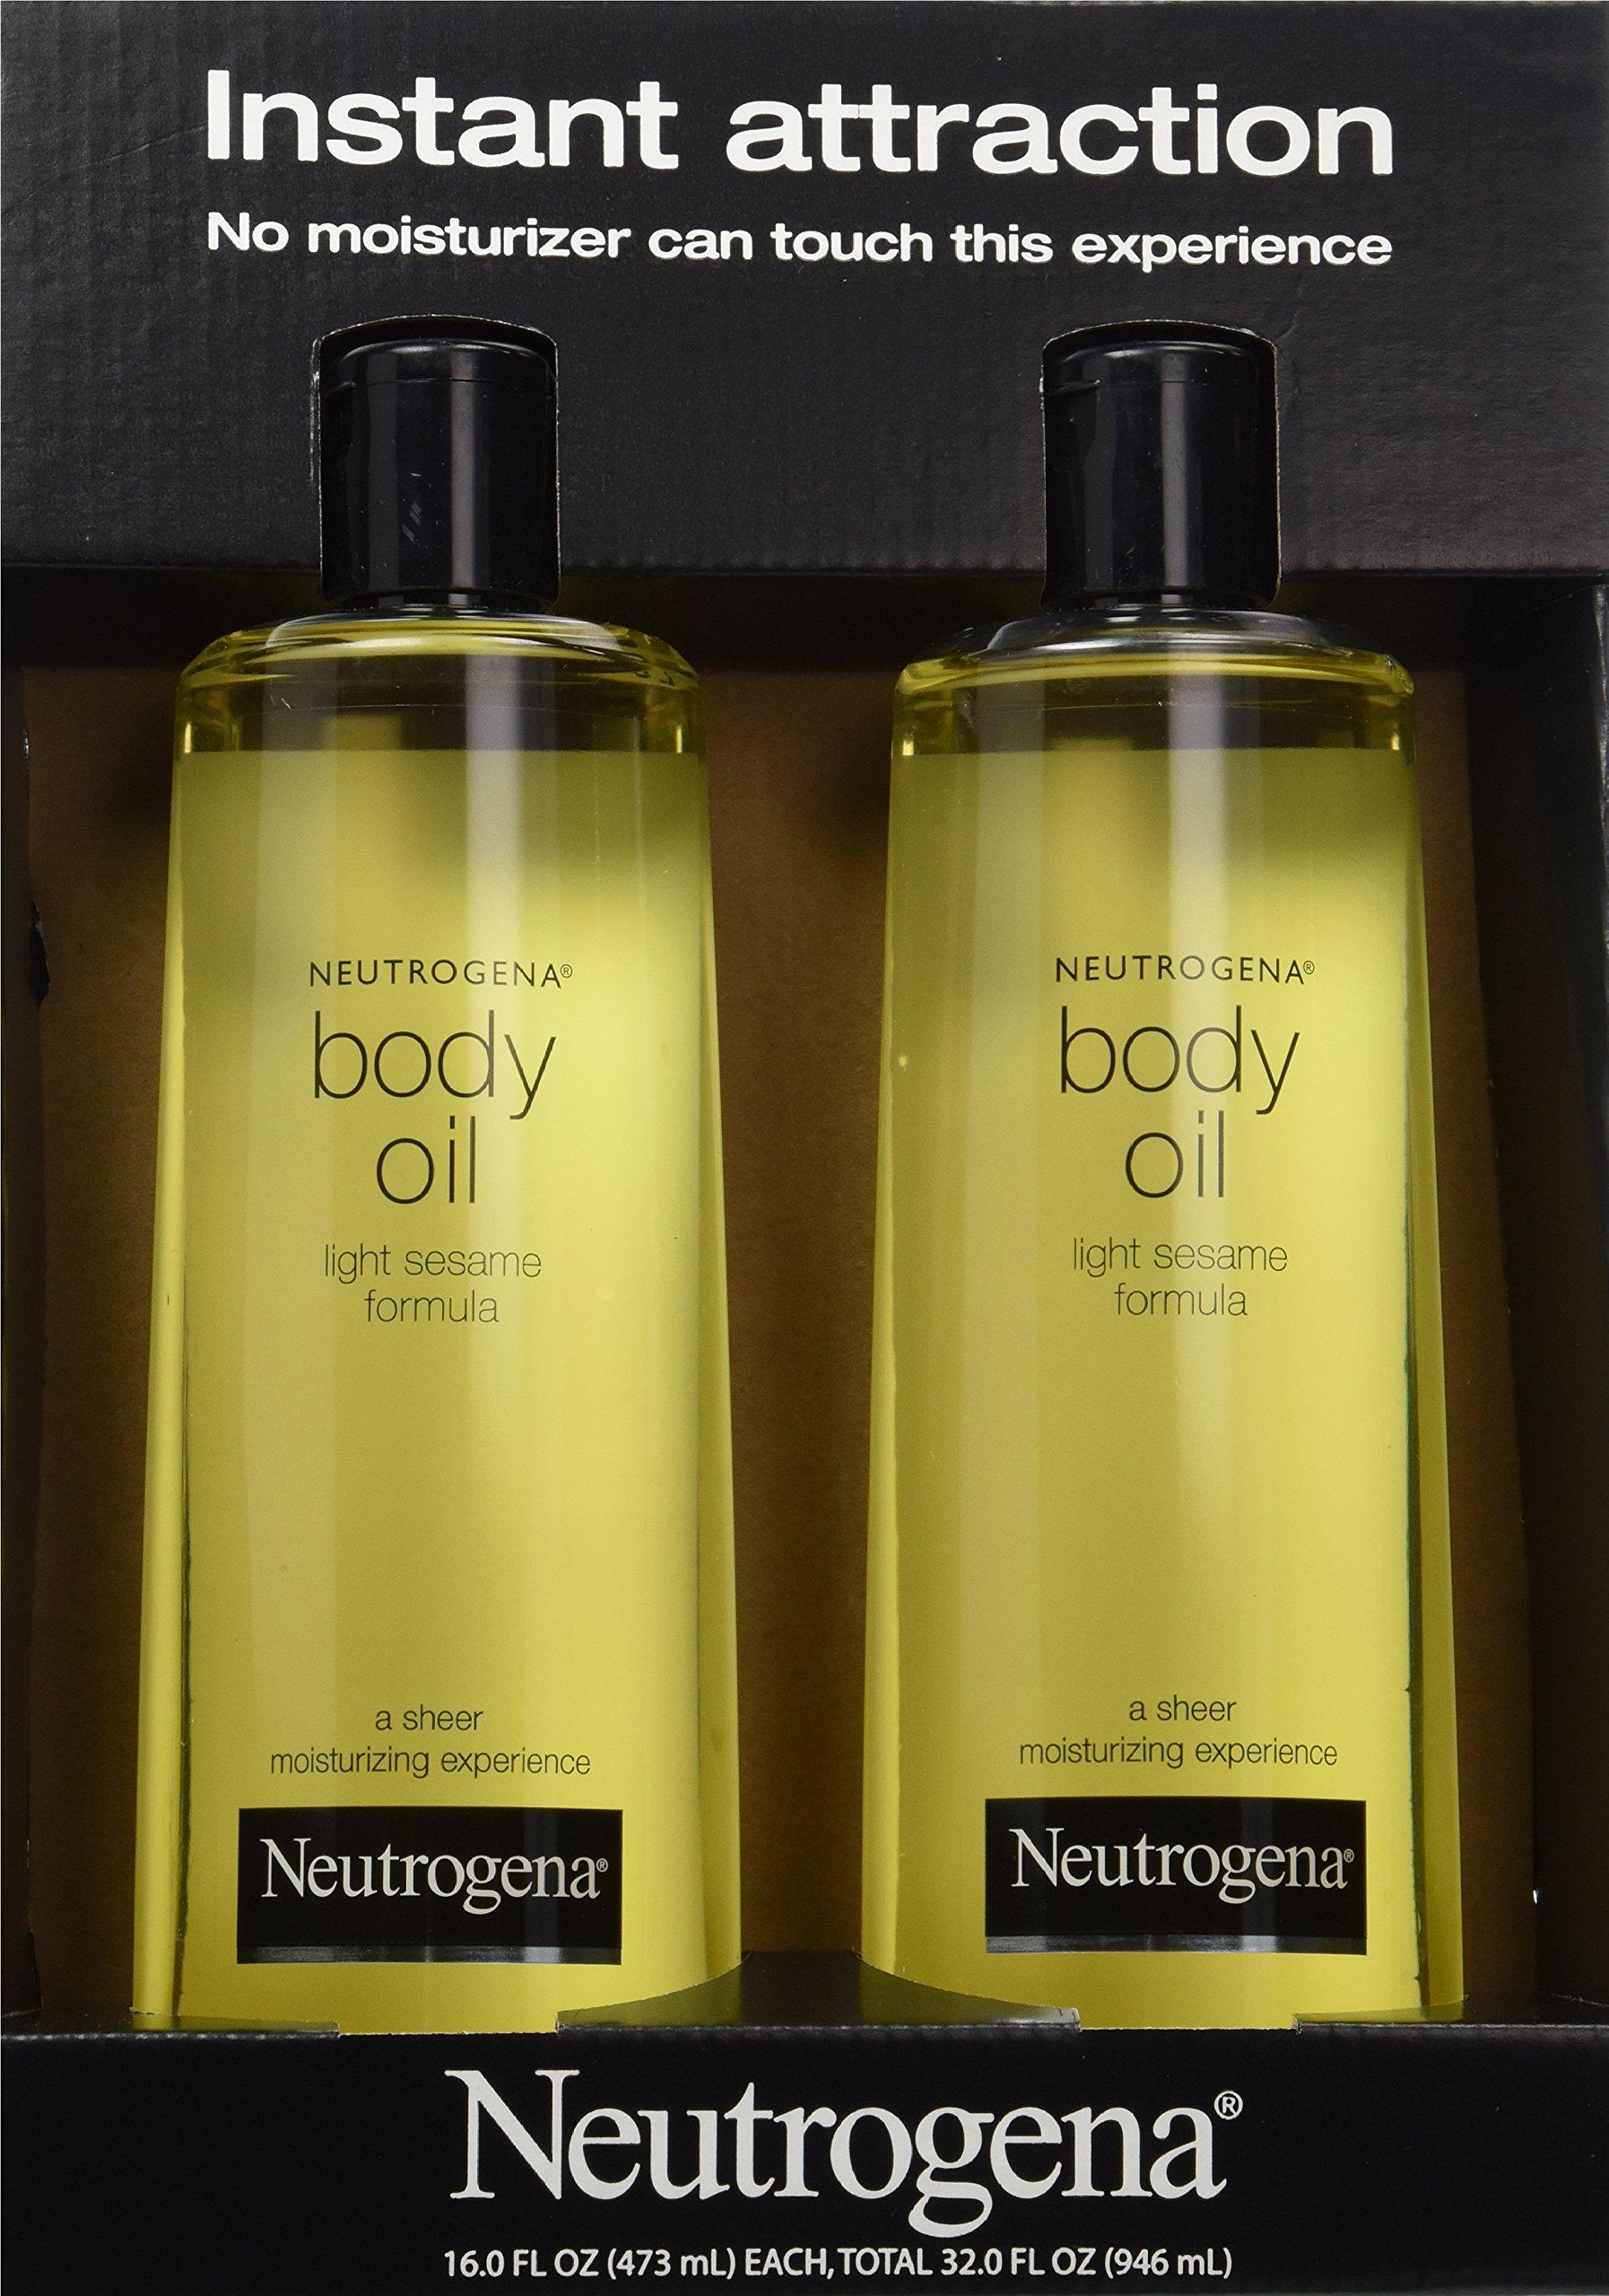 2 Pack of Neutrogena Body Oil Light Sesame Formula, 2-16 fl. oz bottles, Total of 32 fl. oz. by Neutrogena (Image #2)